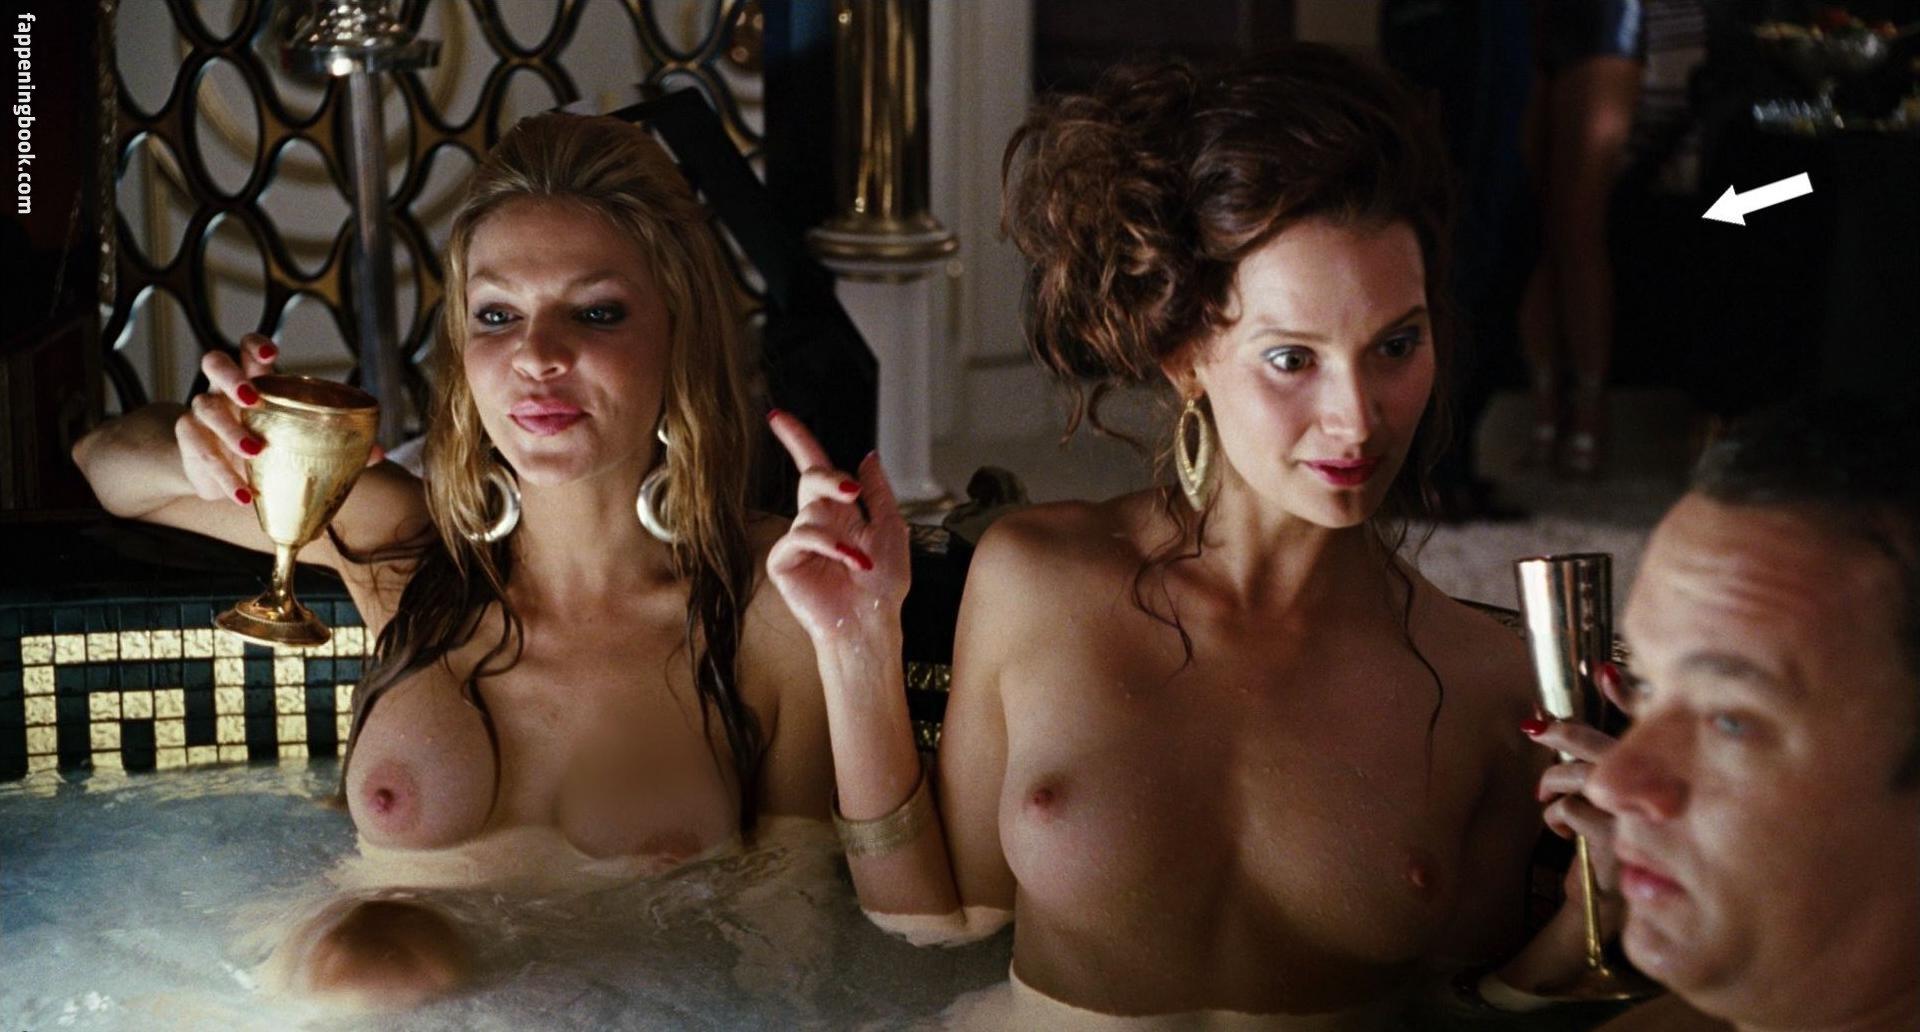 Hilary Angelo Nude